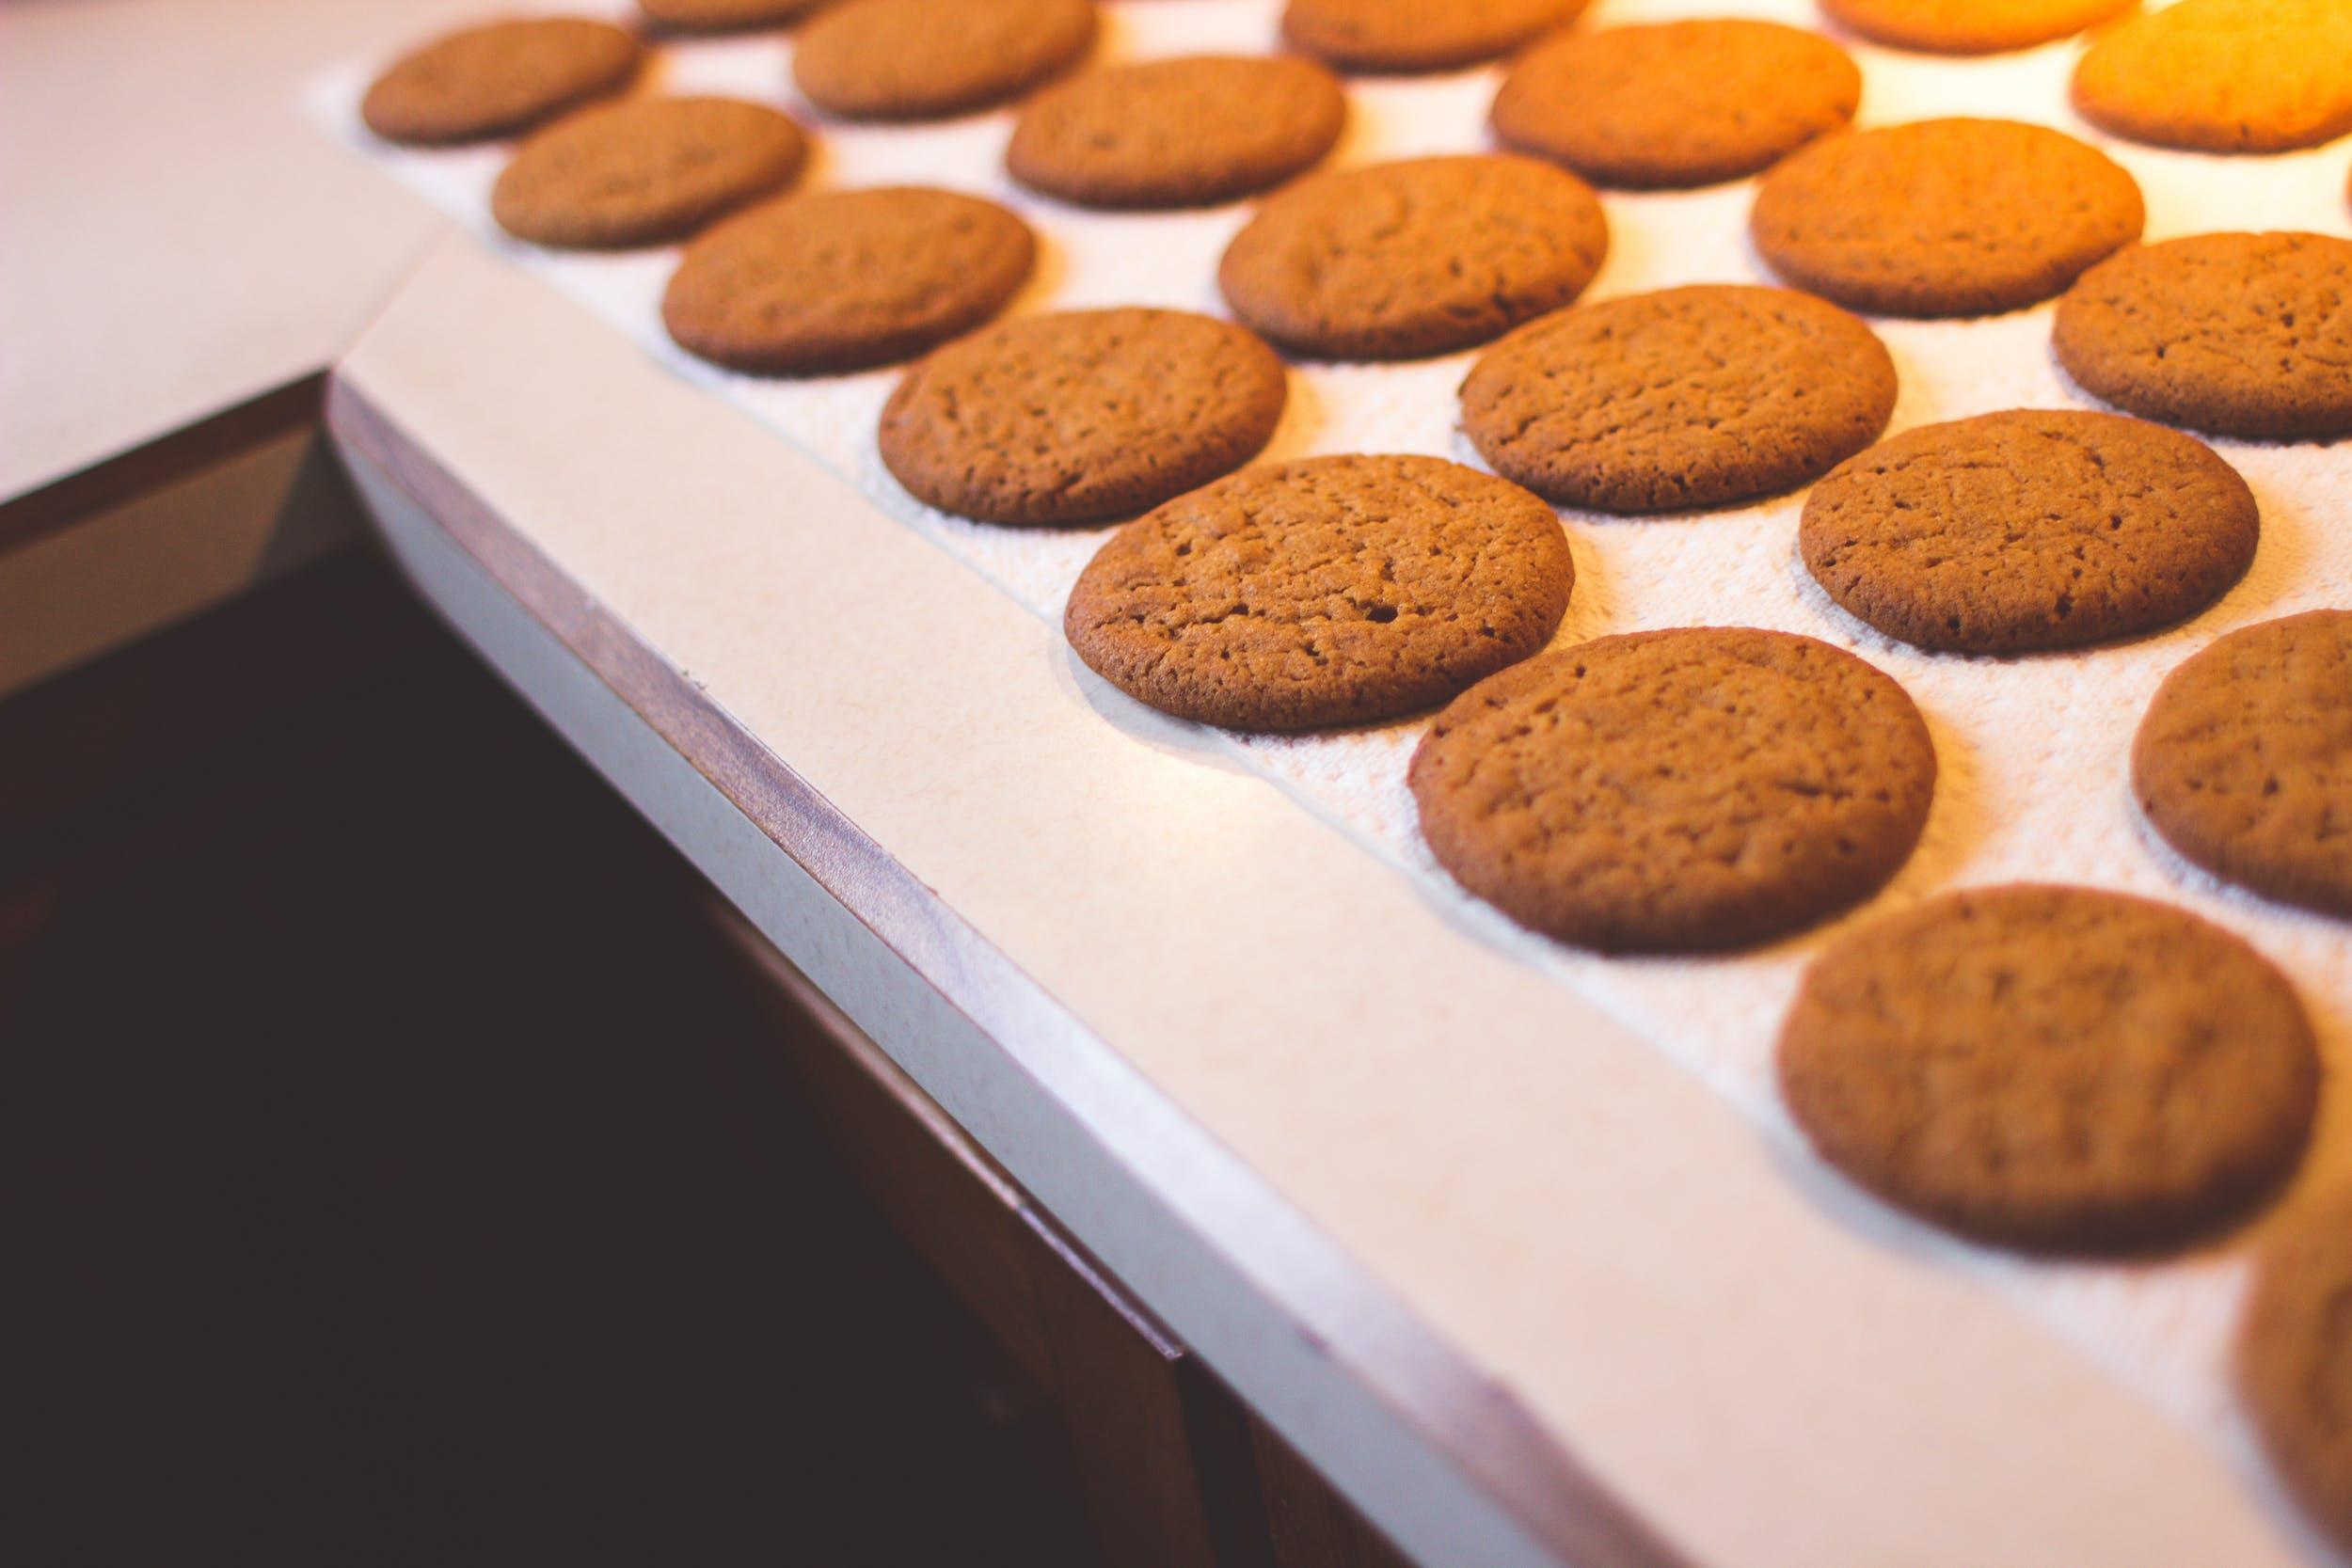 Free stock photo of cookies, baking, bake, counter